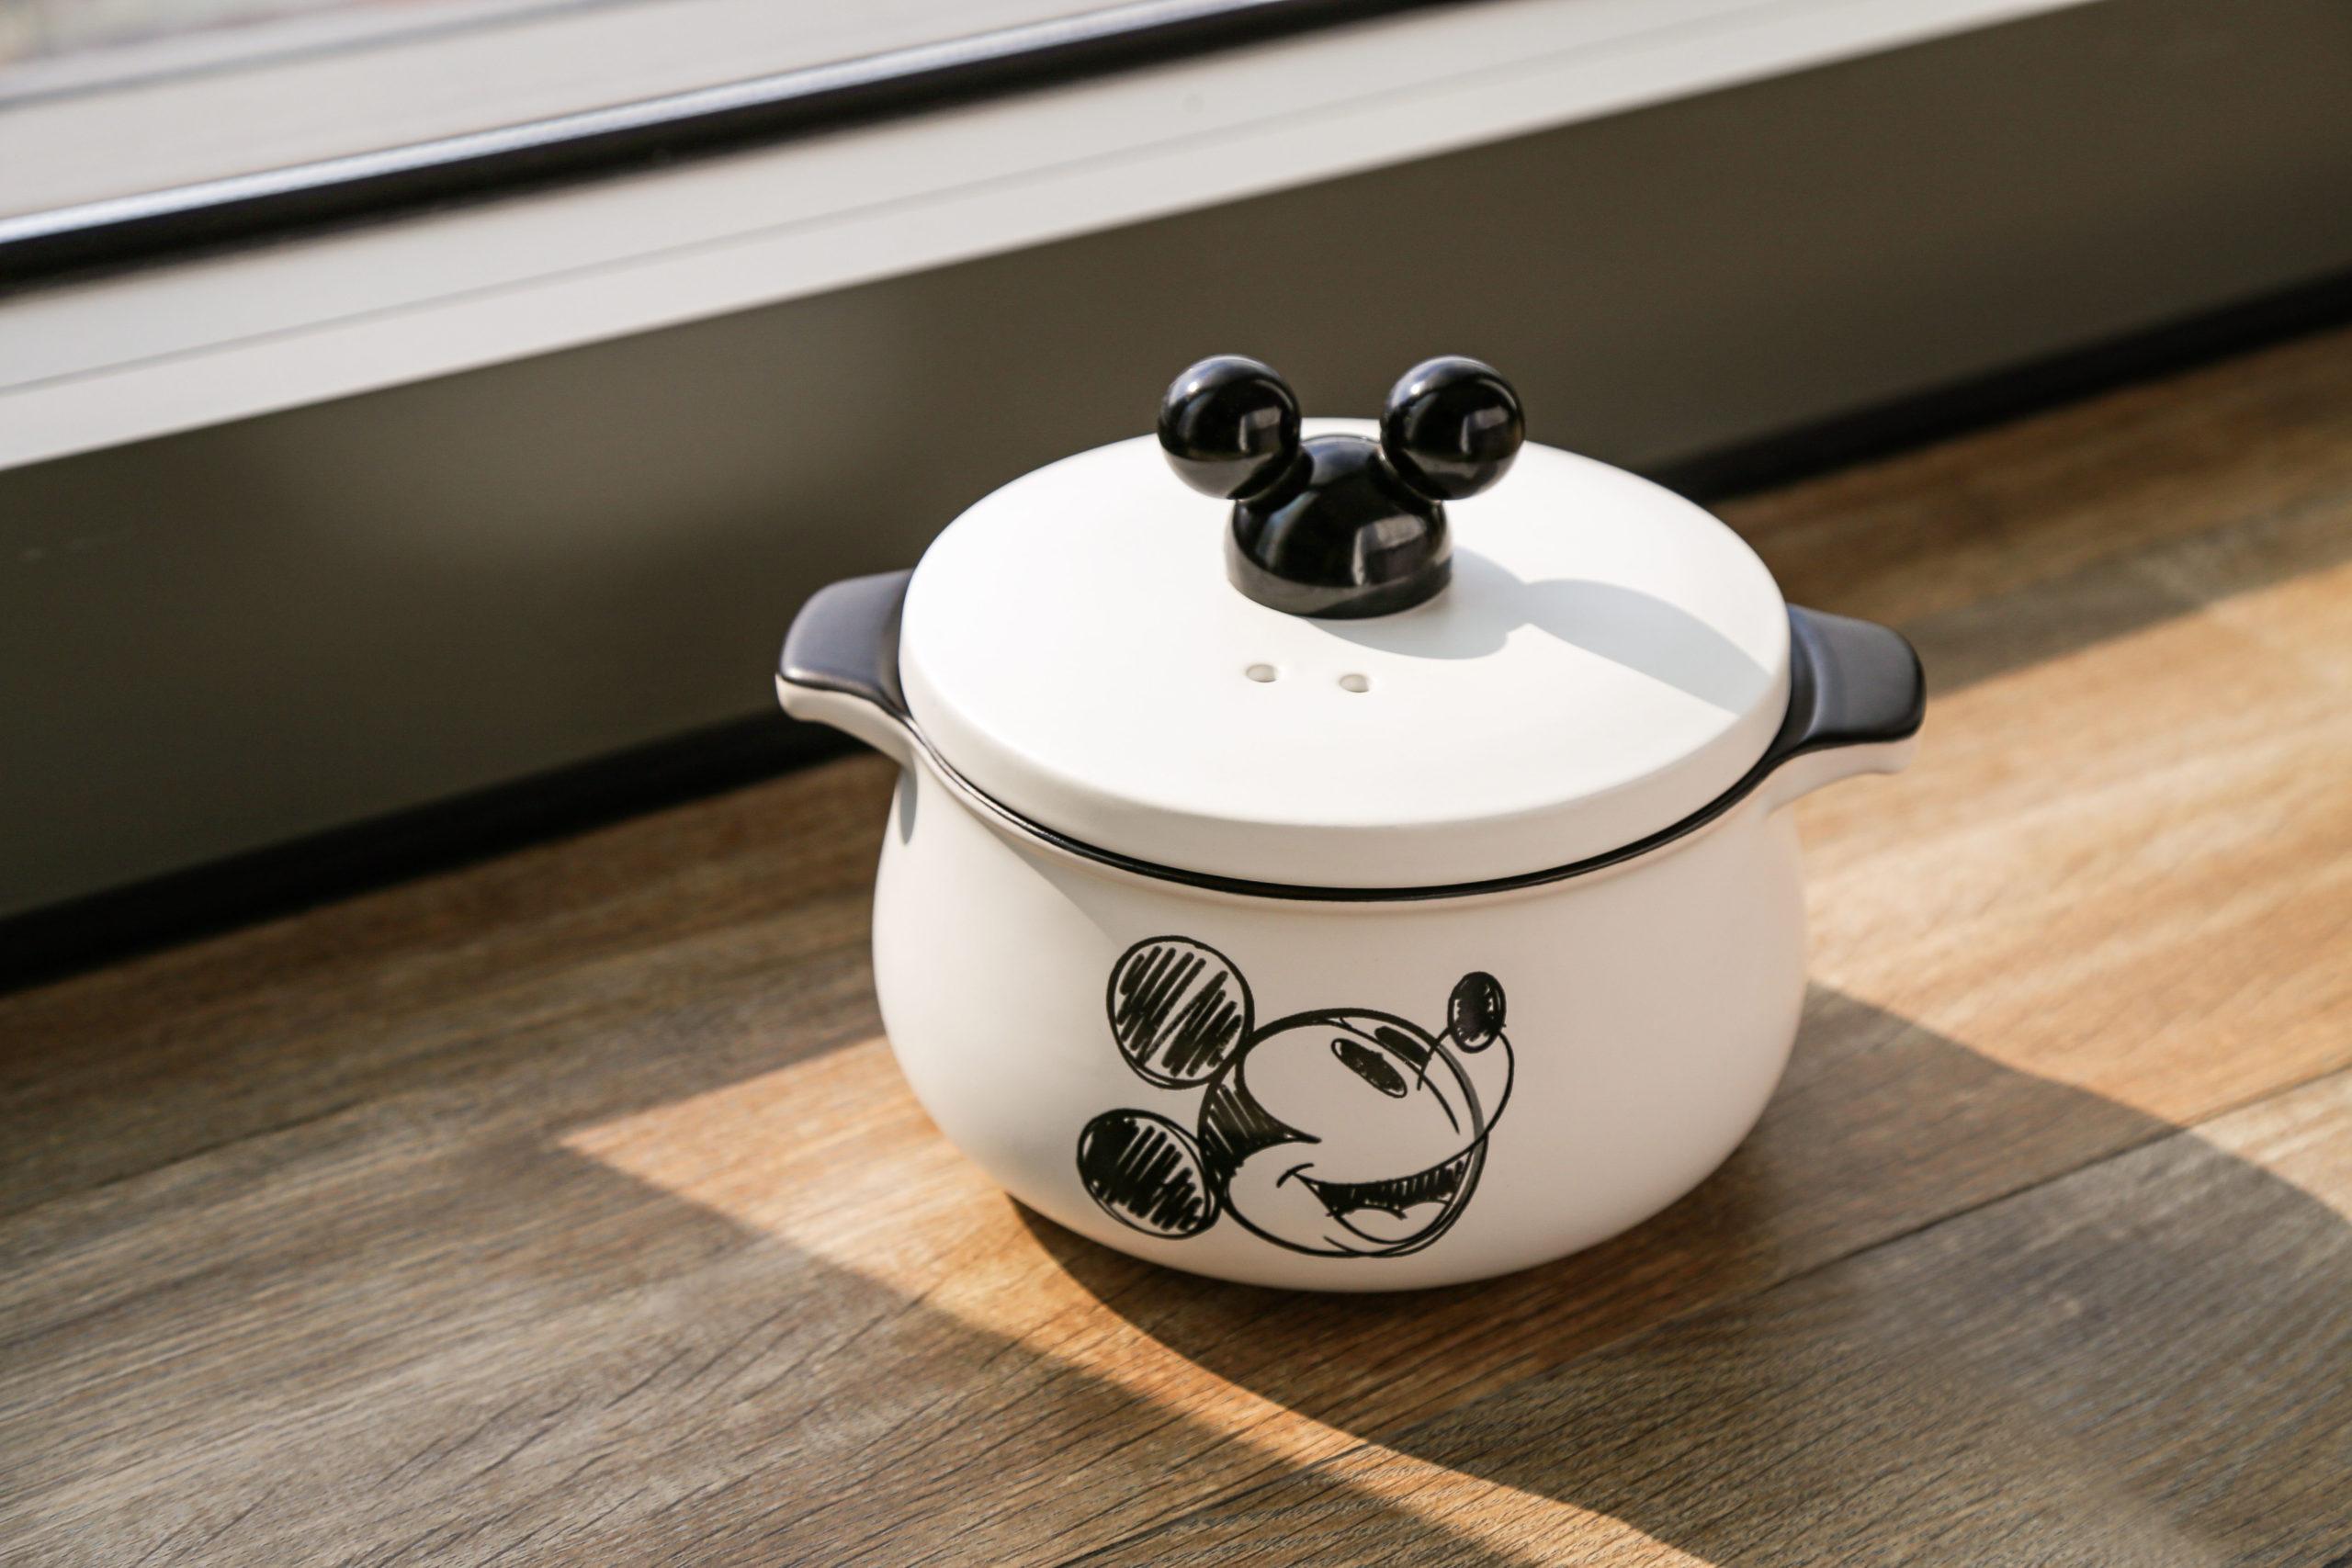 Fairprice Mickey Cooking Pot